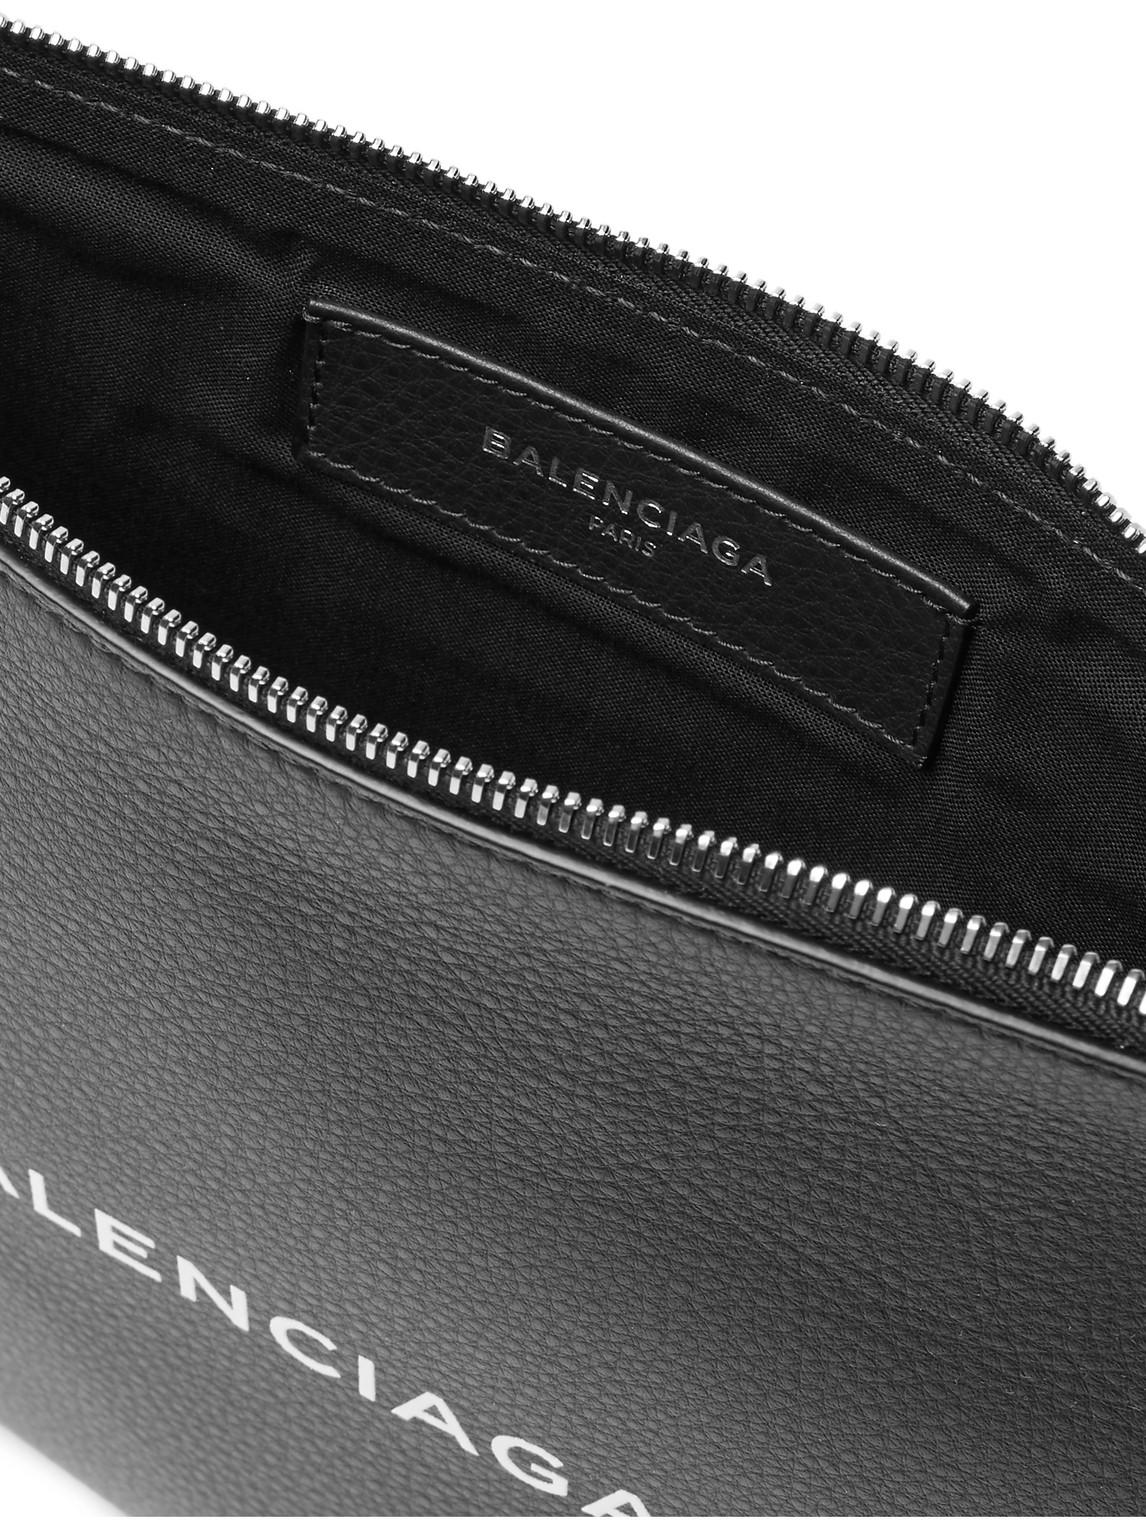 Balenciaga Backpacks LOGO-PRINT CREASED-LEATHER POUCH